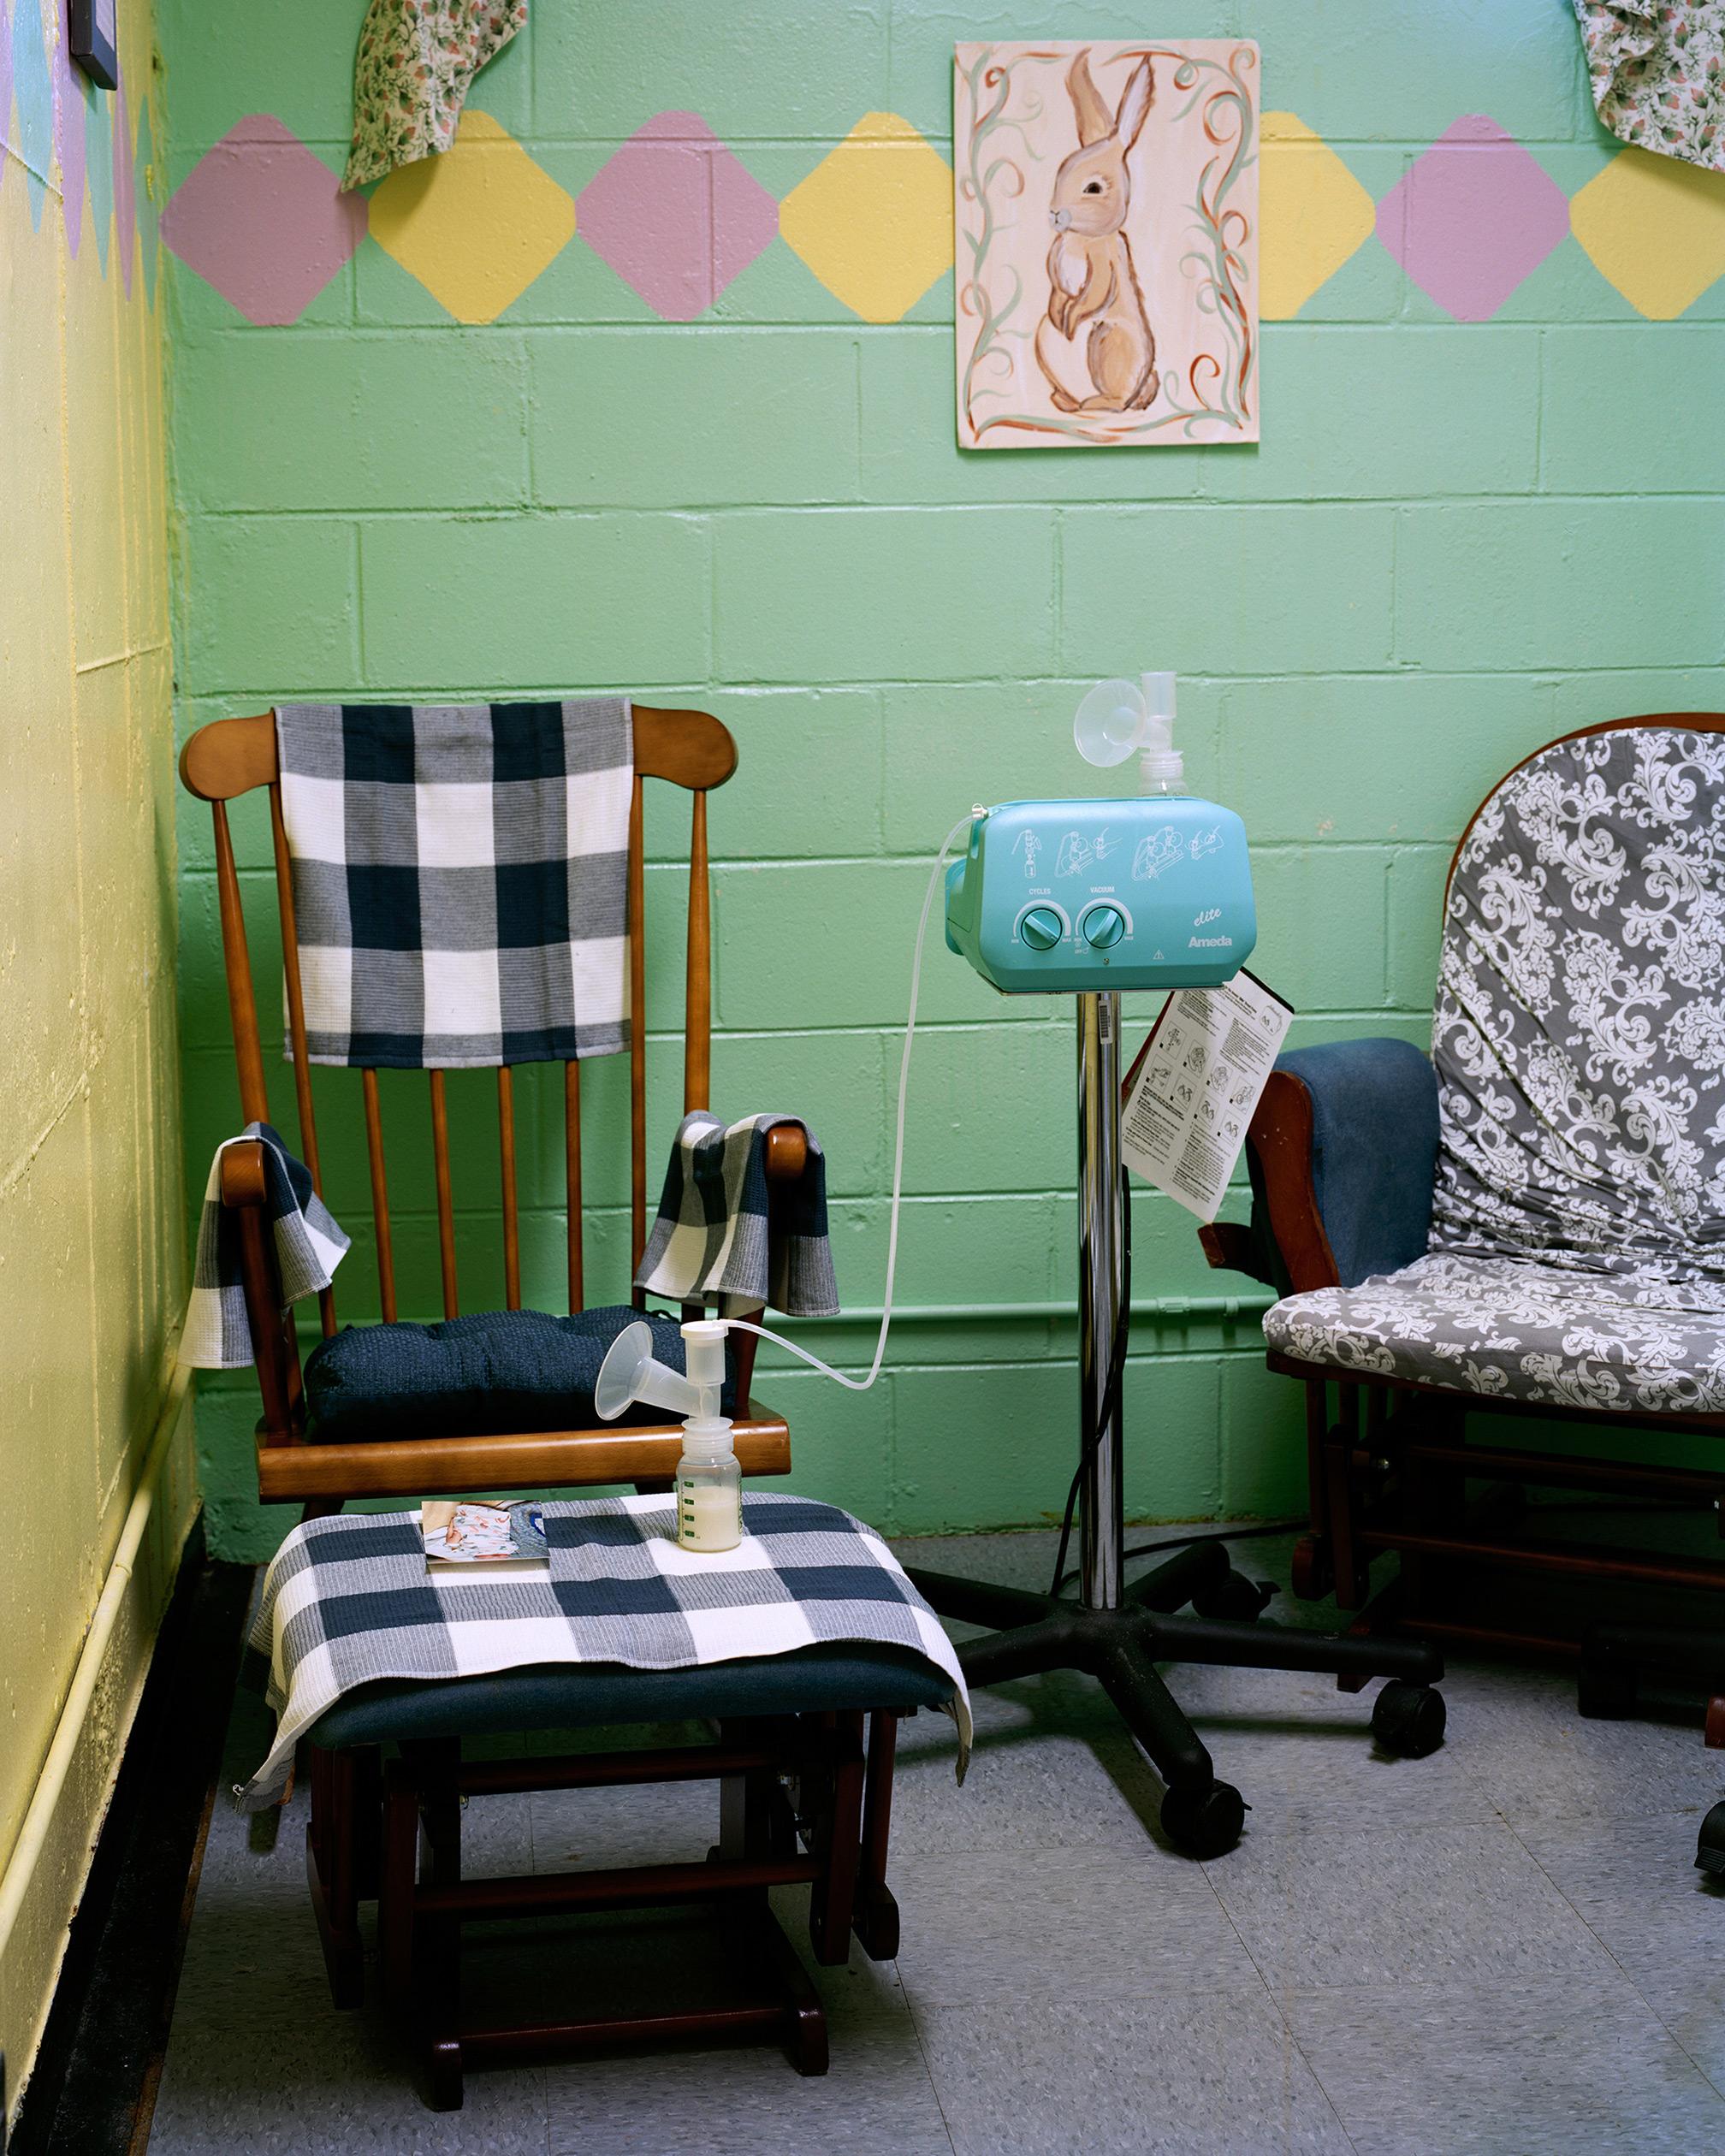 Inmate, Julia Tutwiler Prison for Women, Wetumpka, Alabama